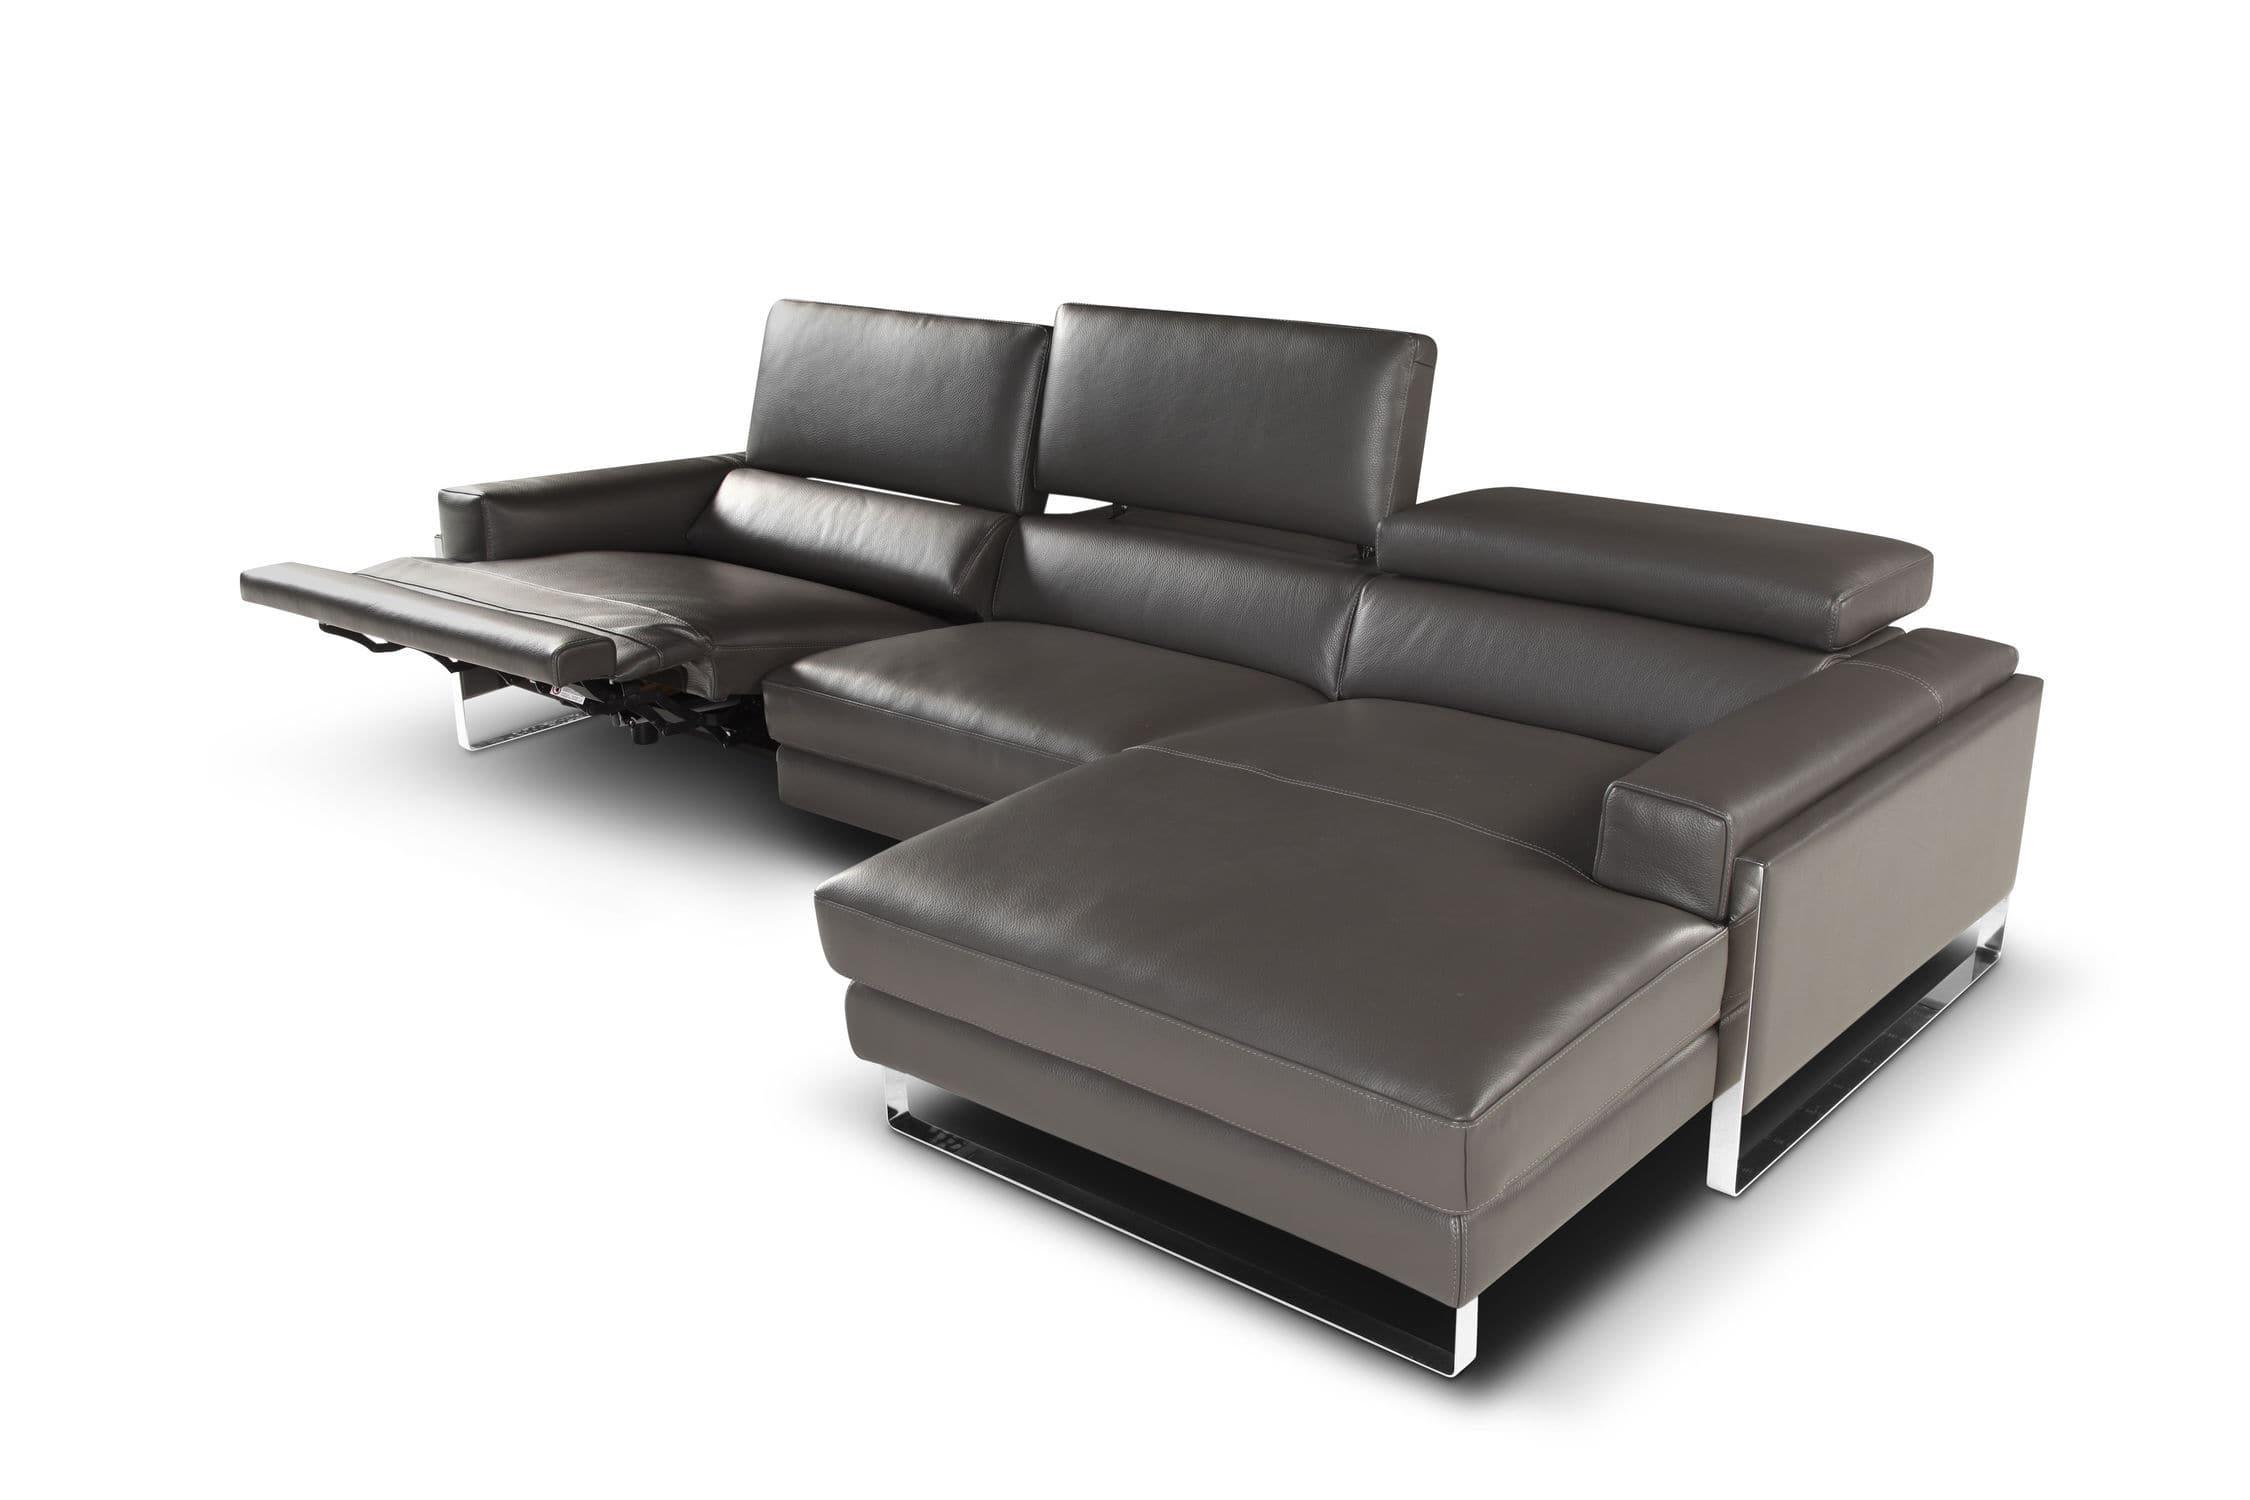 Leather Modular Sofa Black Leather Modular Sofa By De Sede